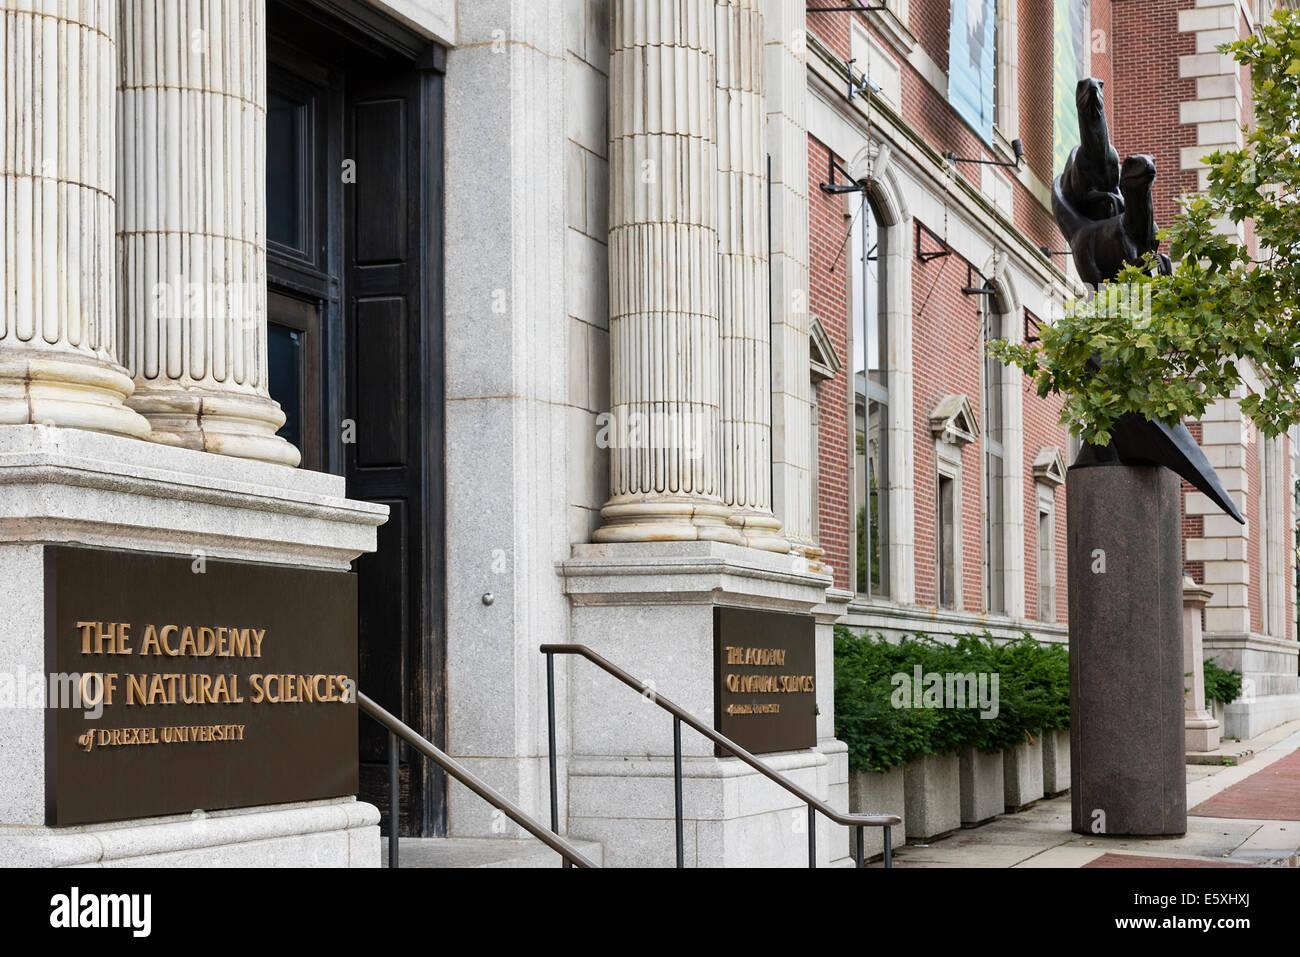 The Academy of Natural Sciences of Drexel University, Philadelphia, Pennsylvania, USA - Stock Image